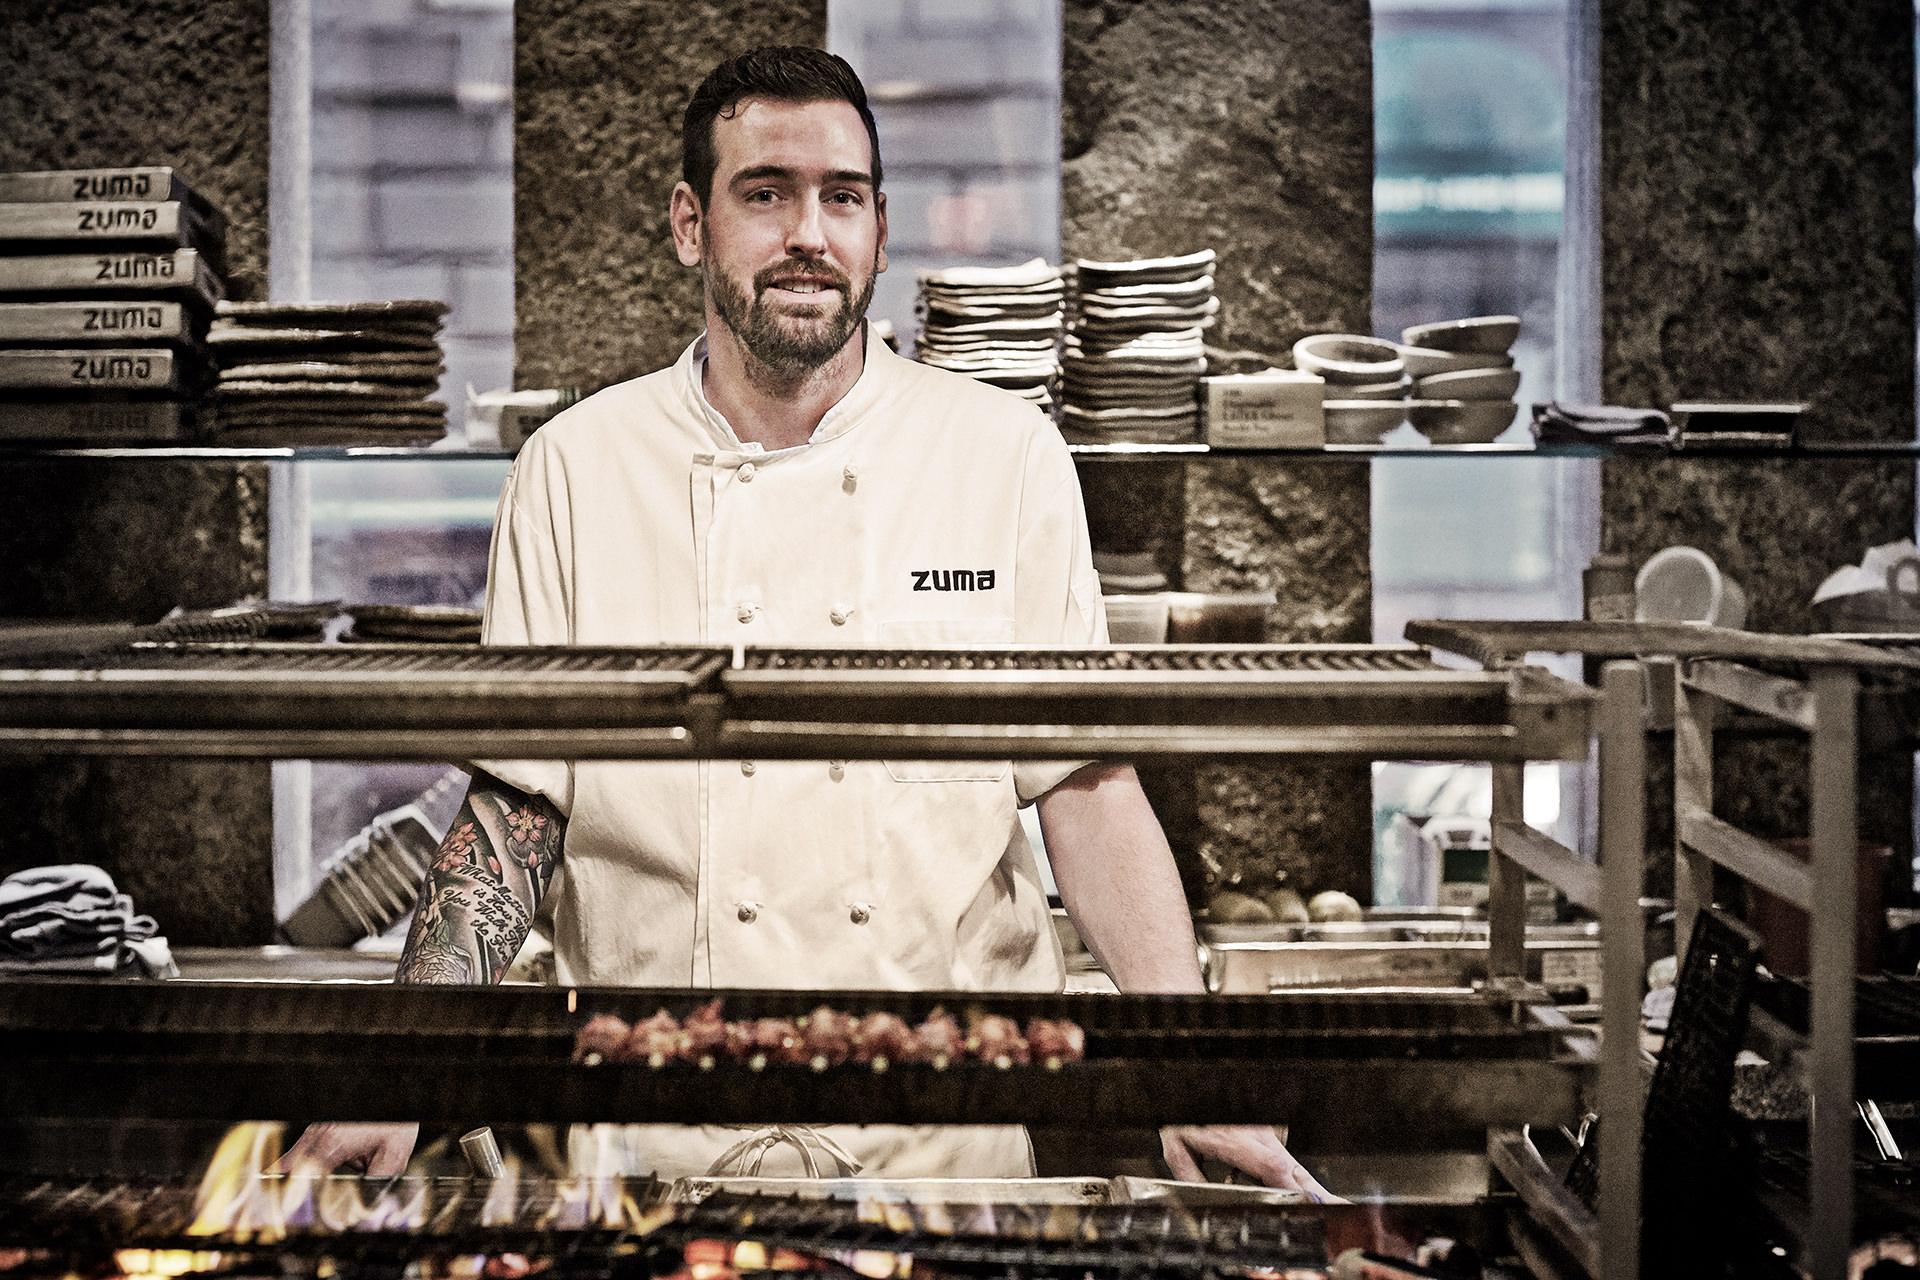 portrait-corporate-restaurant-kitchen-john